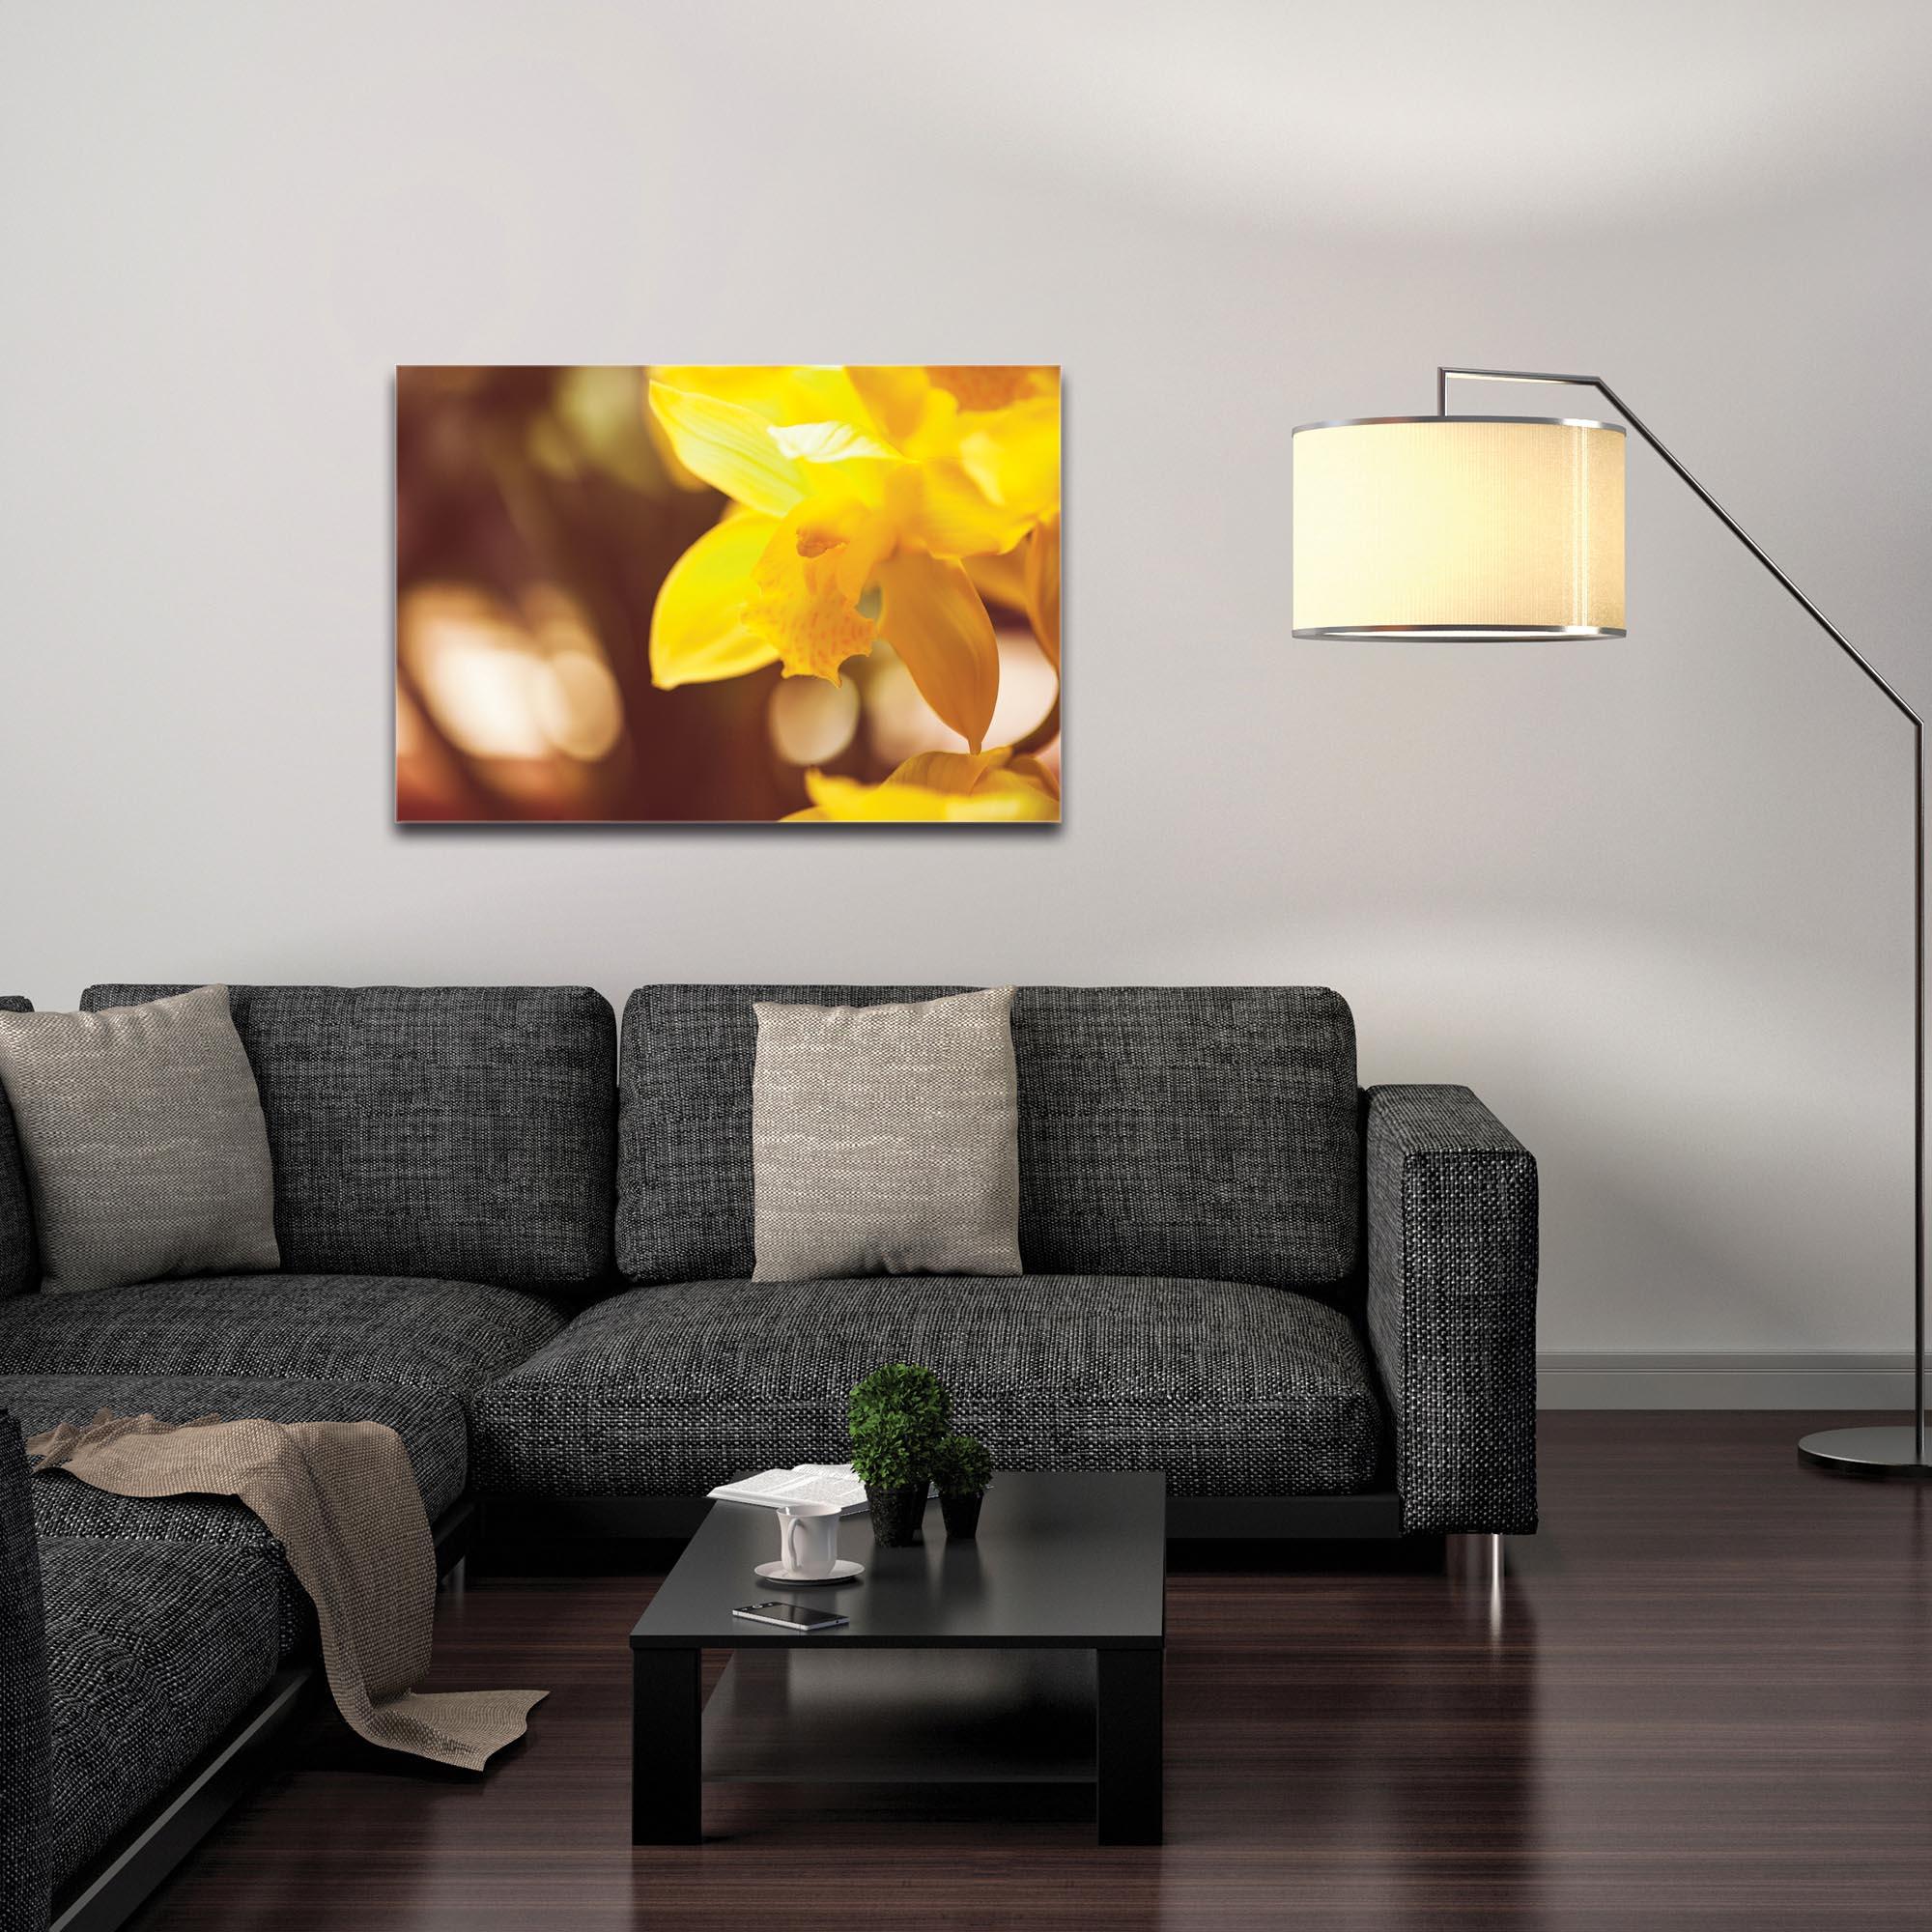 Nature Photography 'Golden Bloom' - Flower Blossom Art on Metal or Plexiglass - Image 3